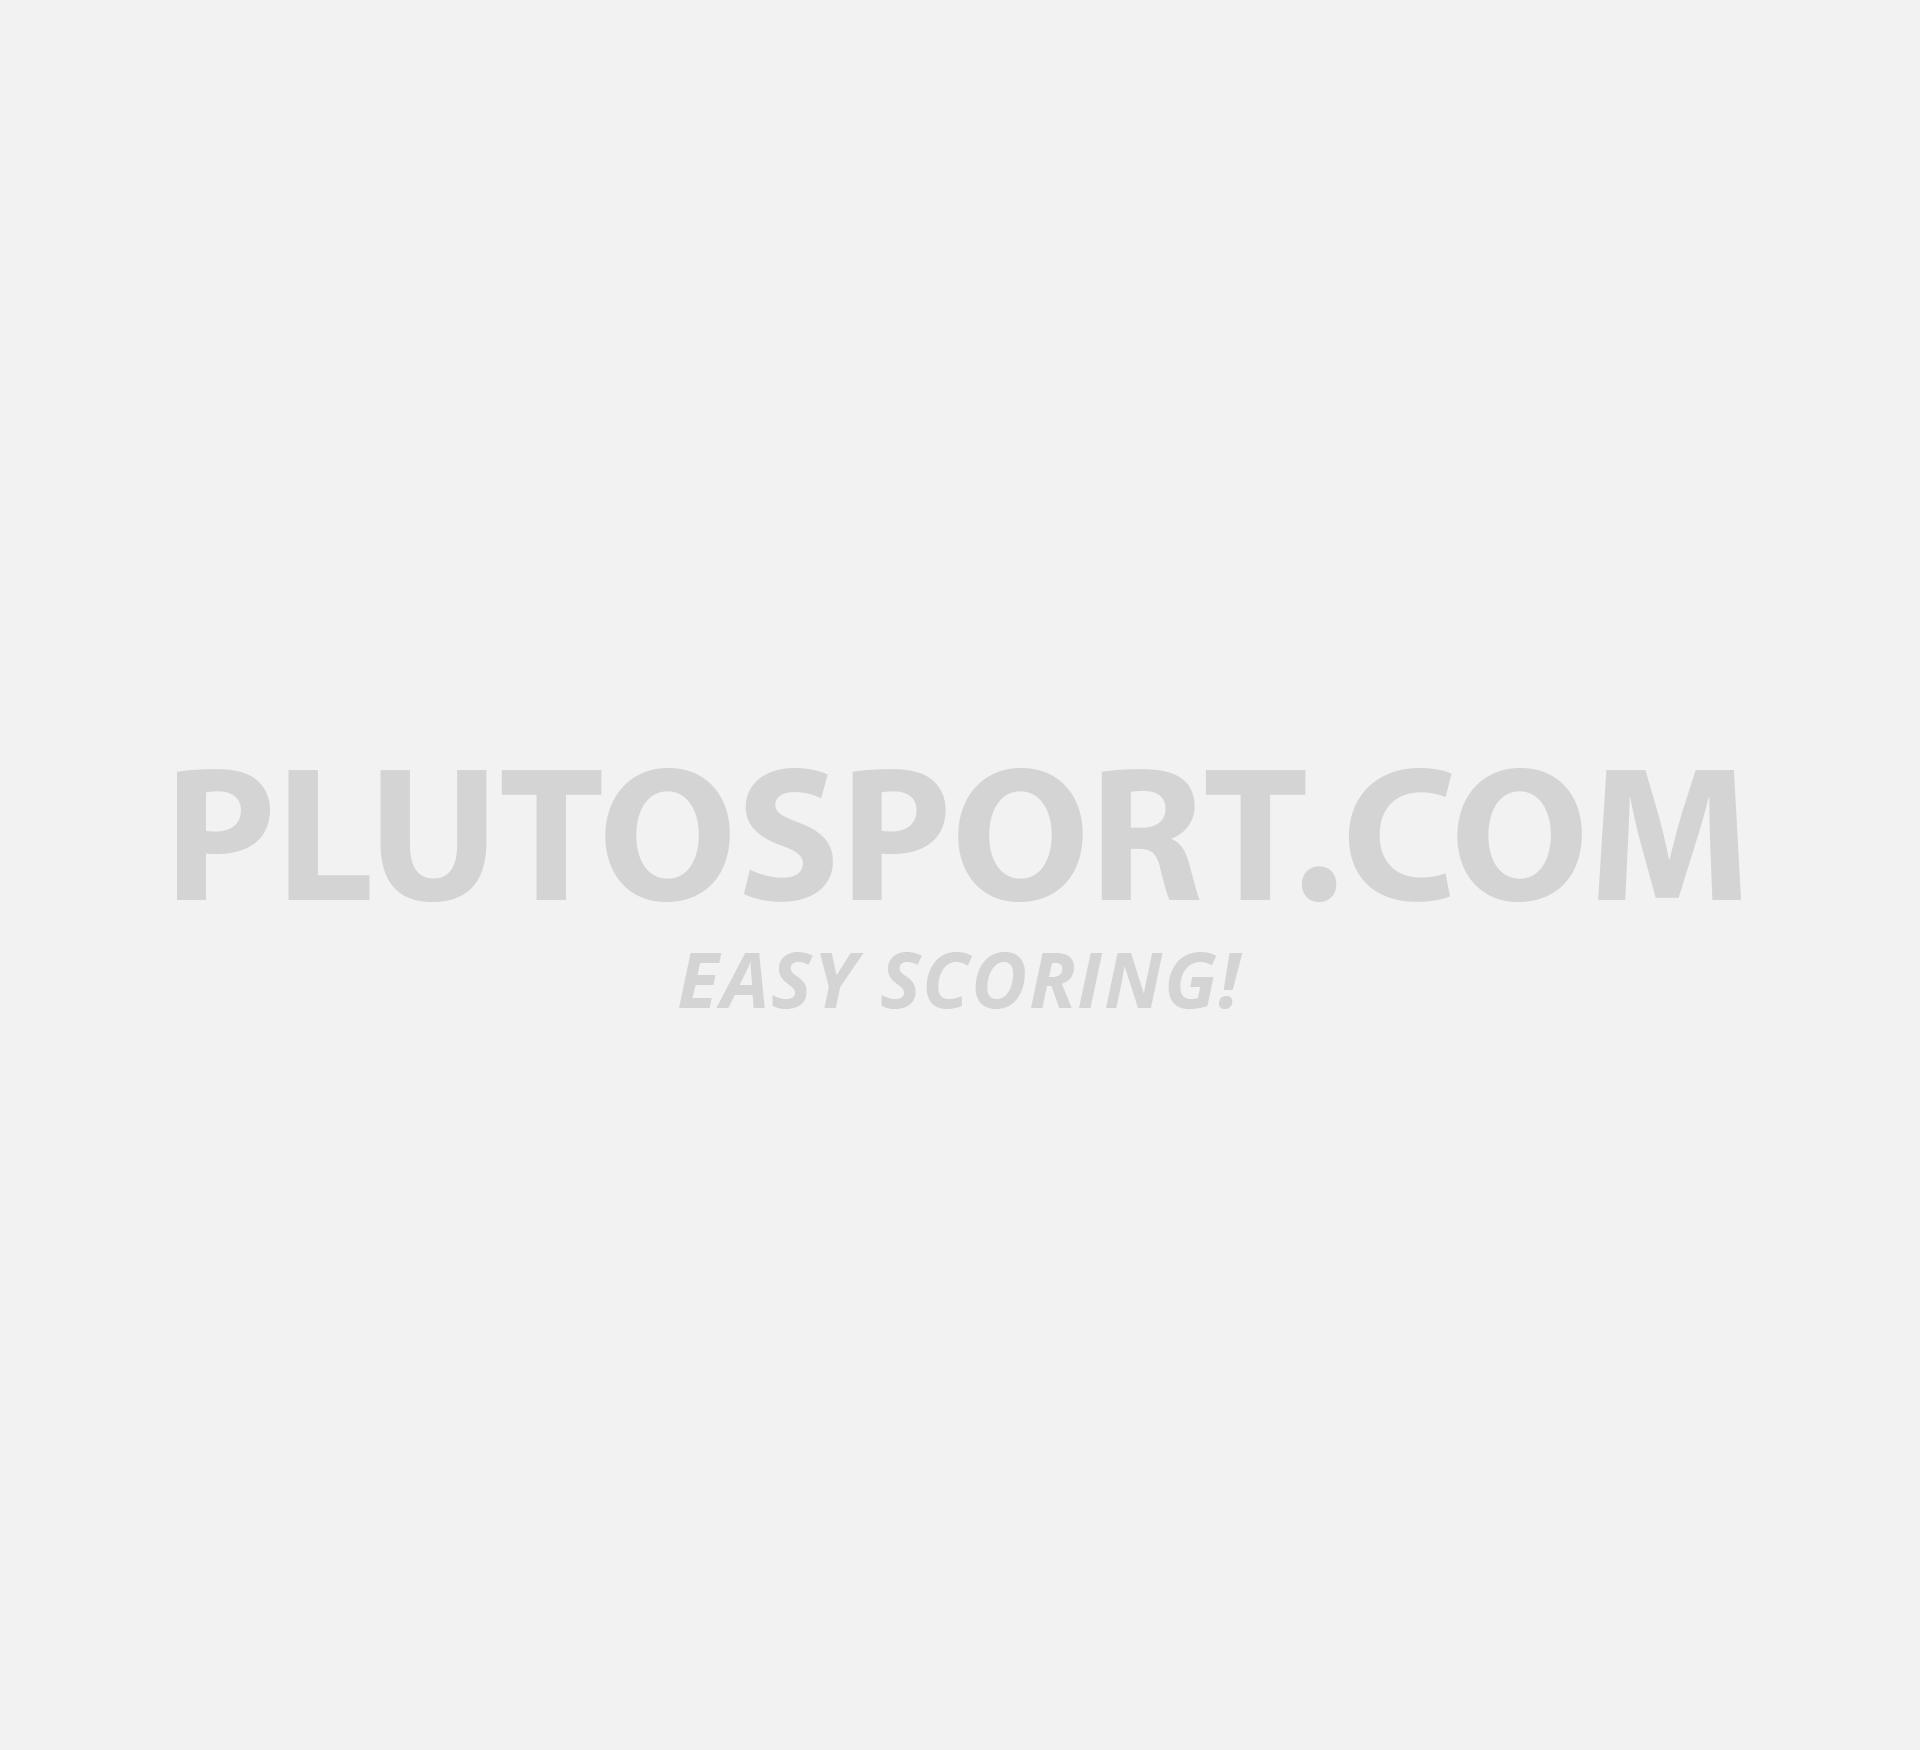 3c3060d5f431 Nike Benassi JDI Print - Bath slippers - Flip flops - Shoes - Lifestyle -  Men